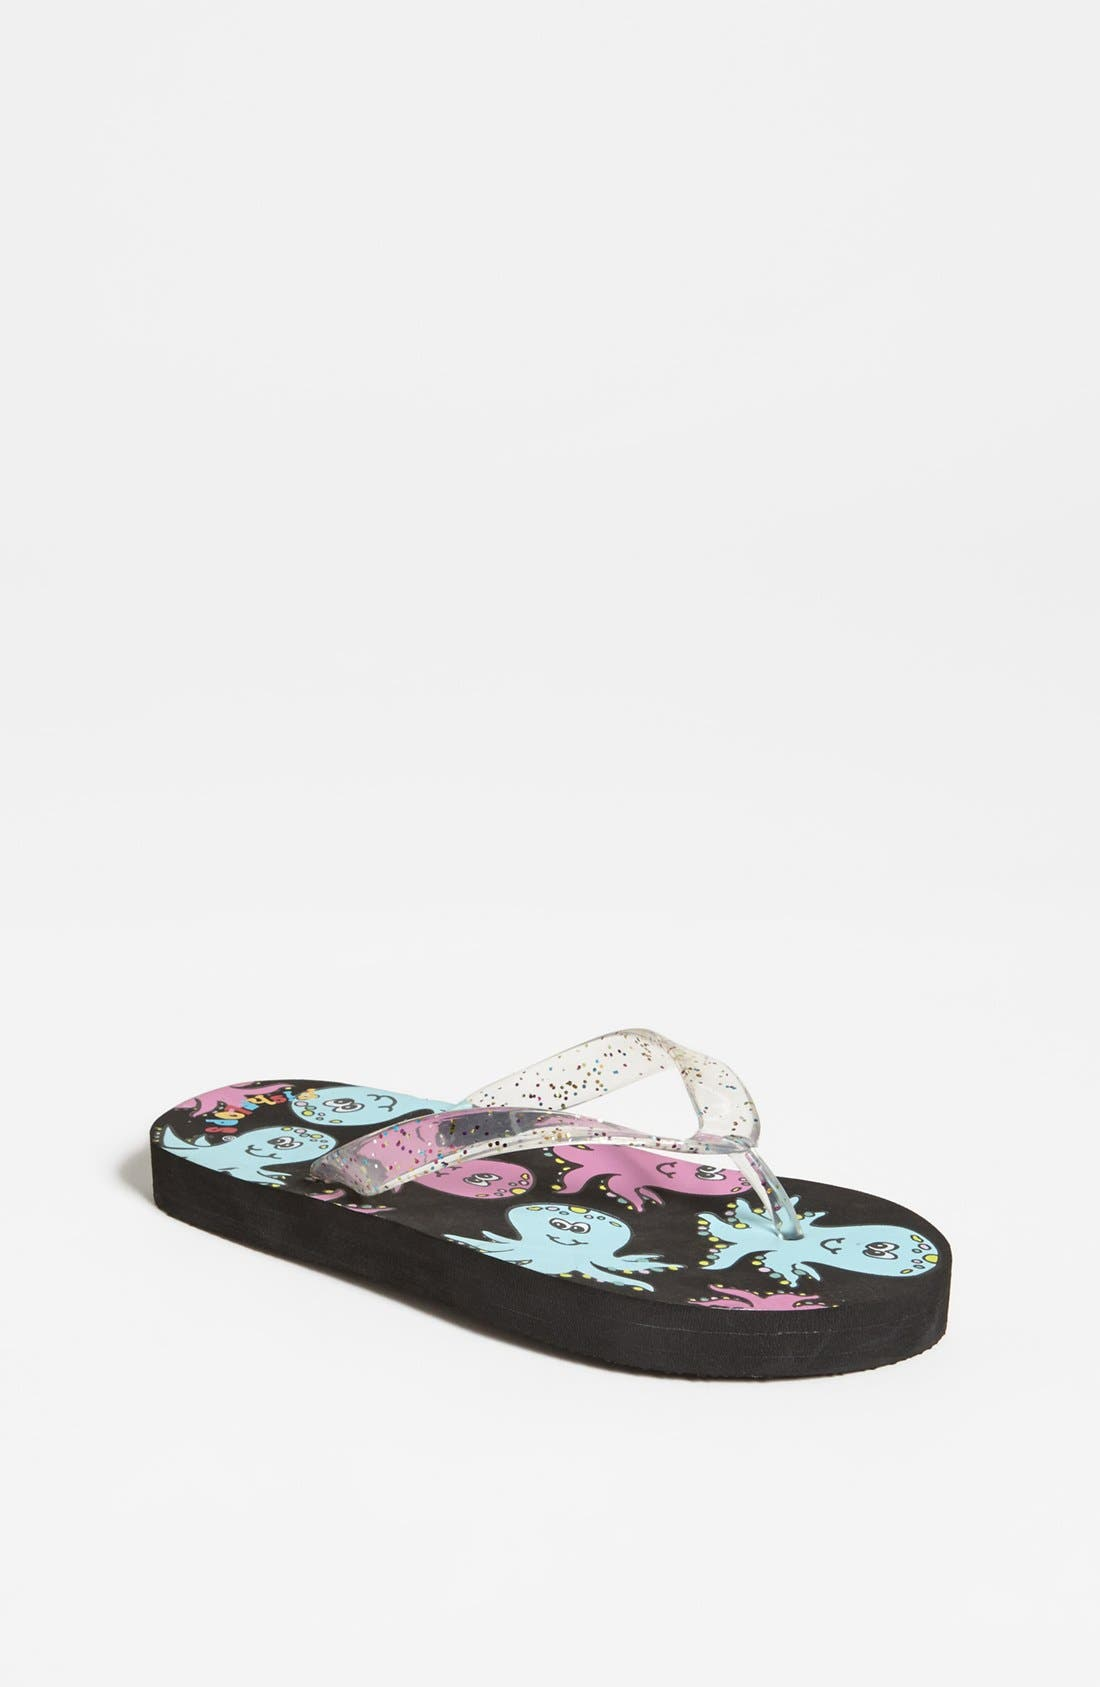 Main Image - Fish Flops 'Octopus' Light-Up Sandal (Walker, Toddler & Little Kid)